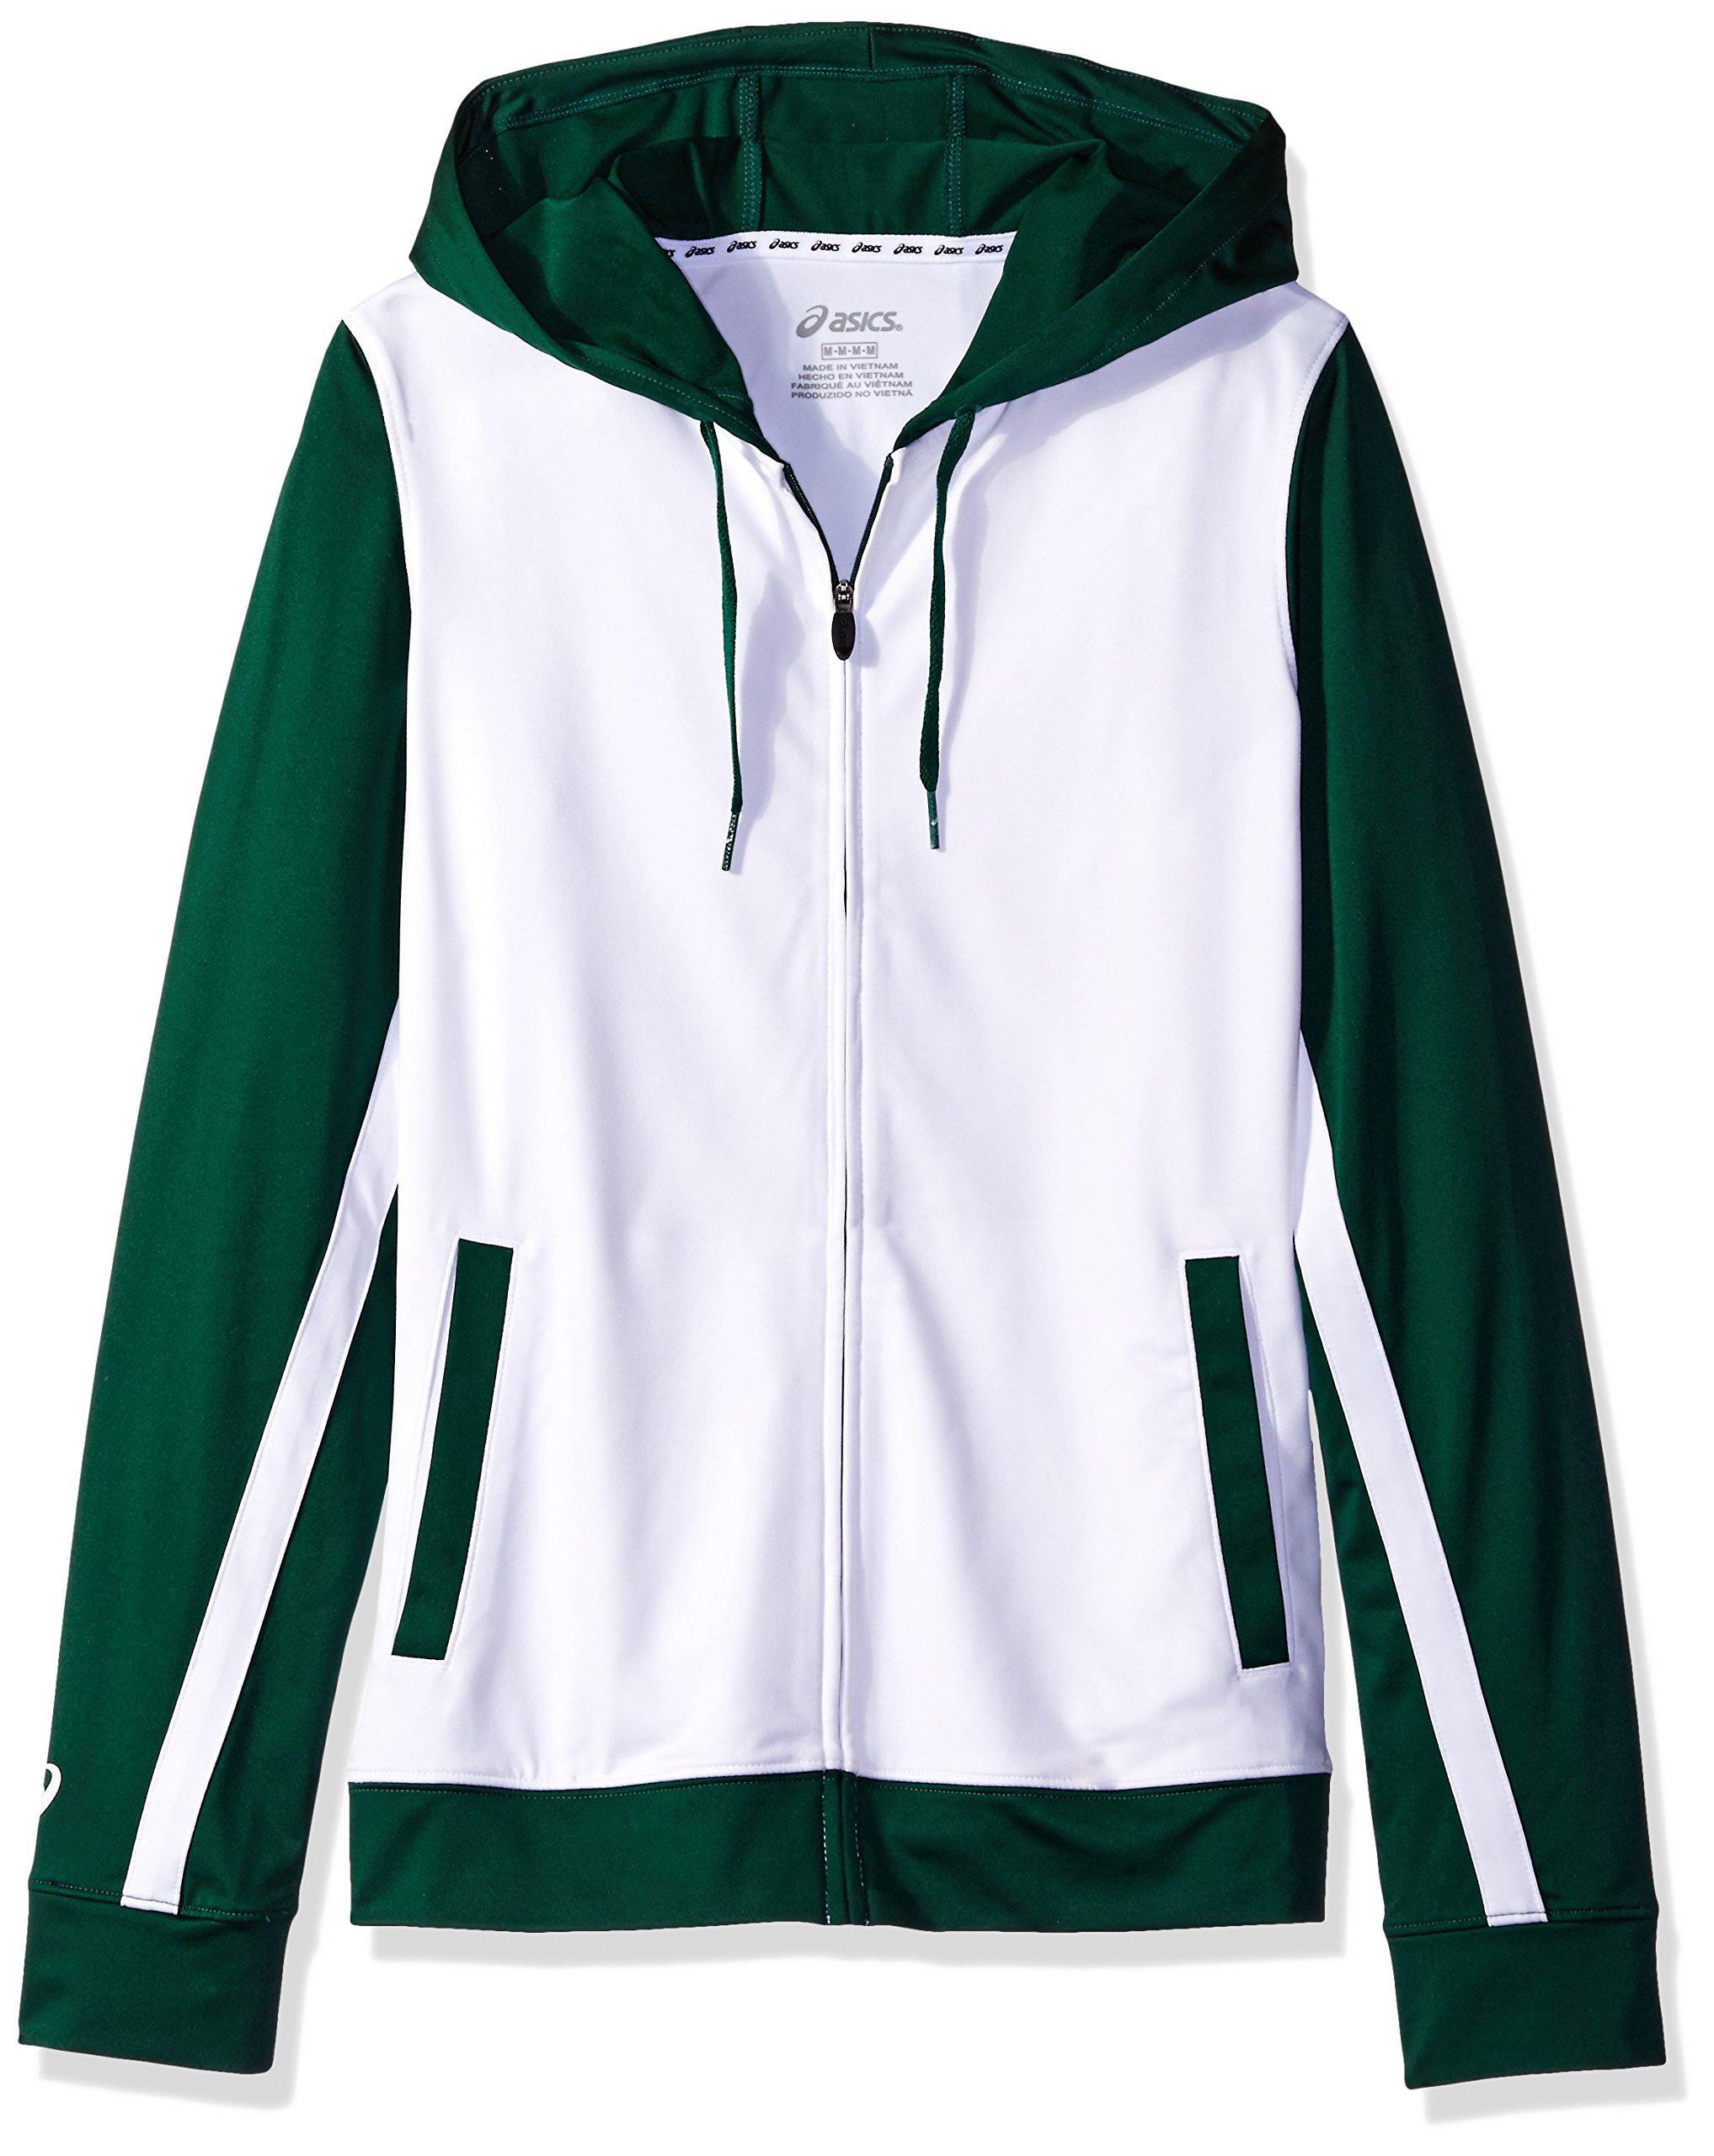 ASICS Jr. LANI Jacket, White/Forest, Medium by ASICS